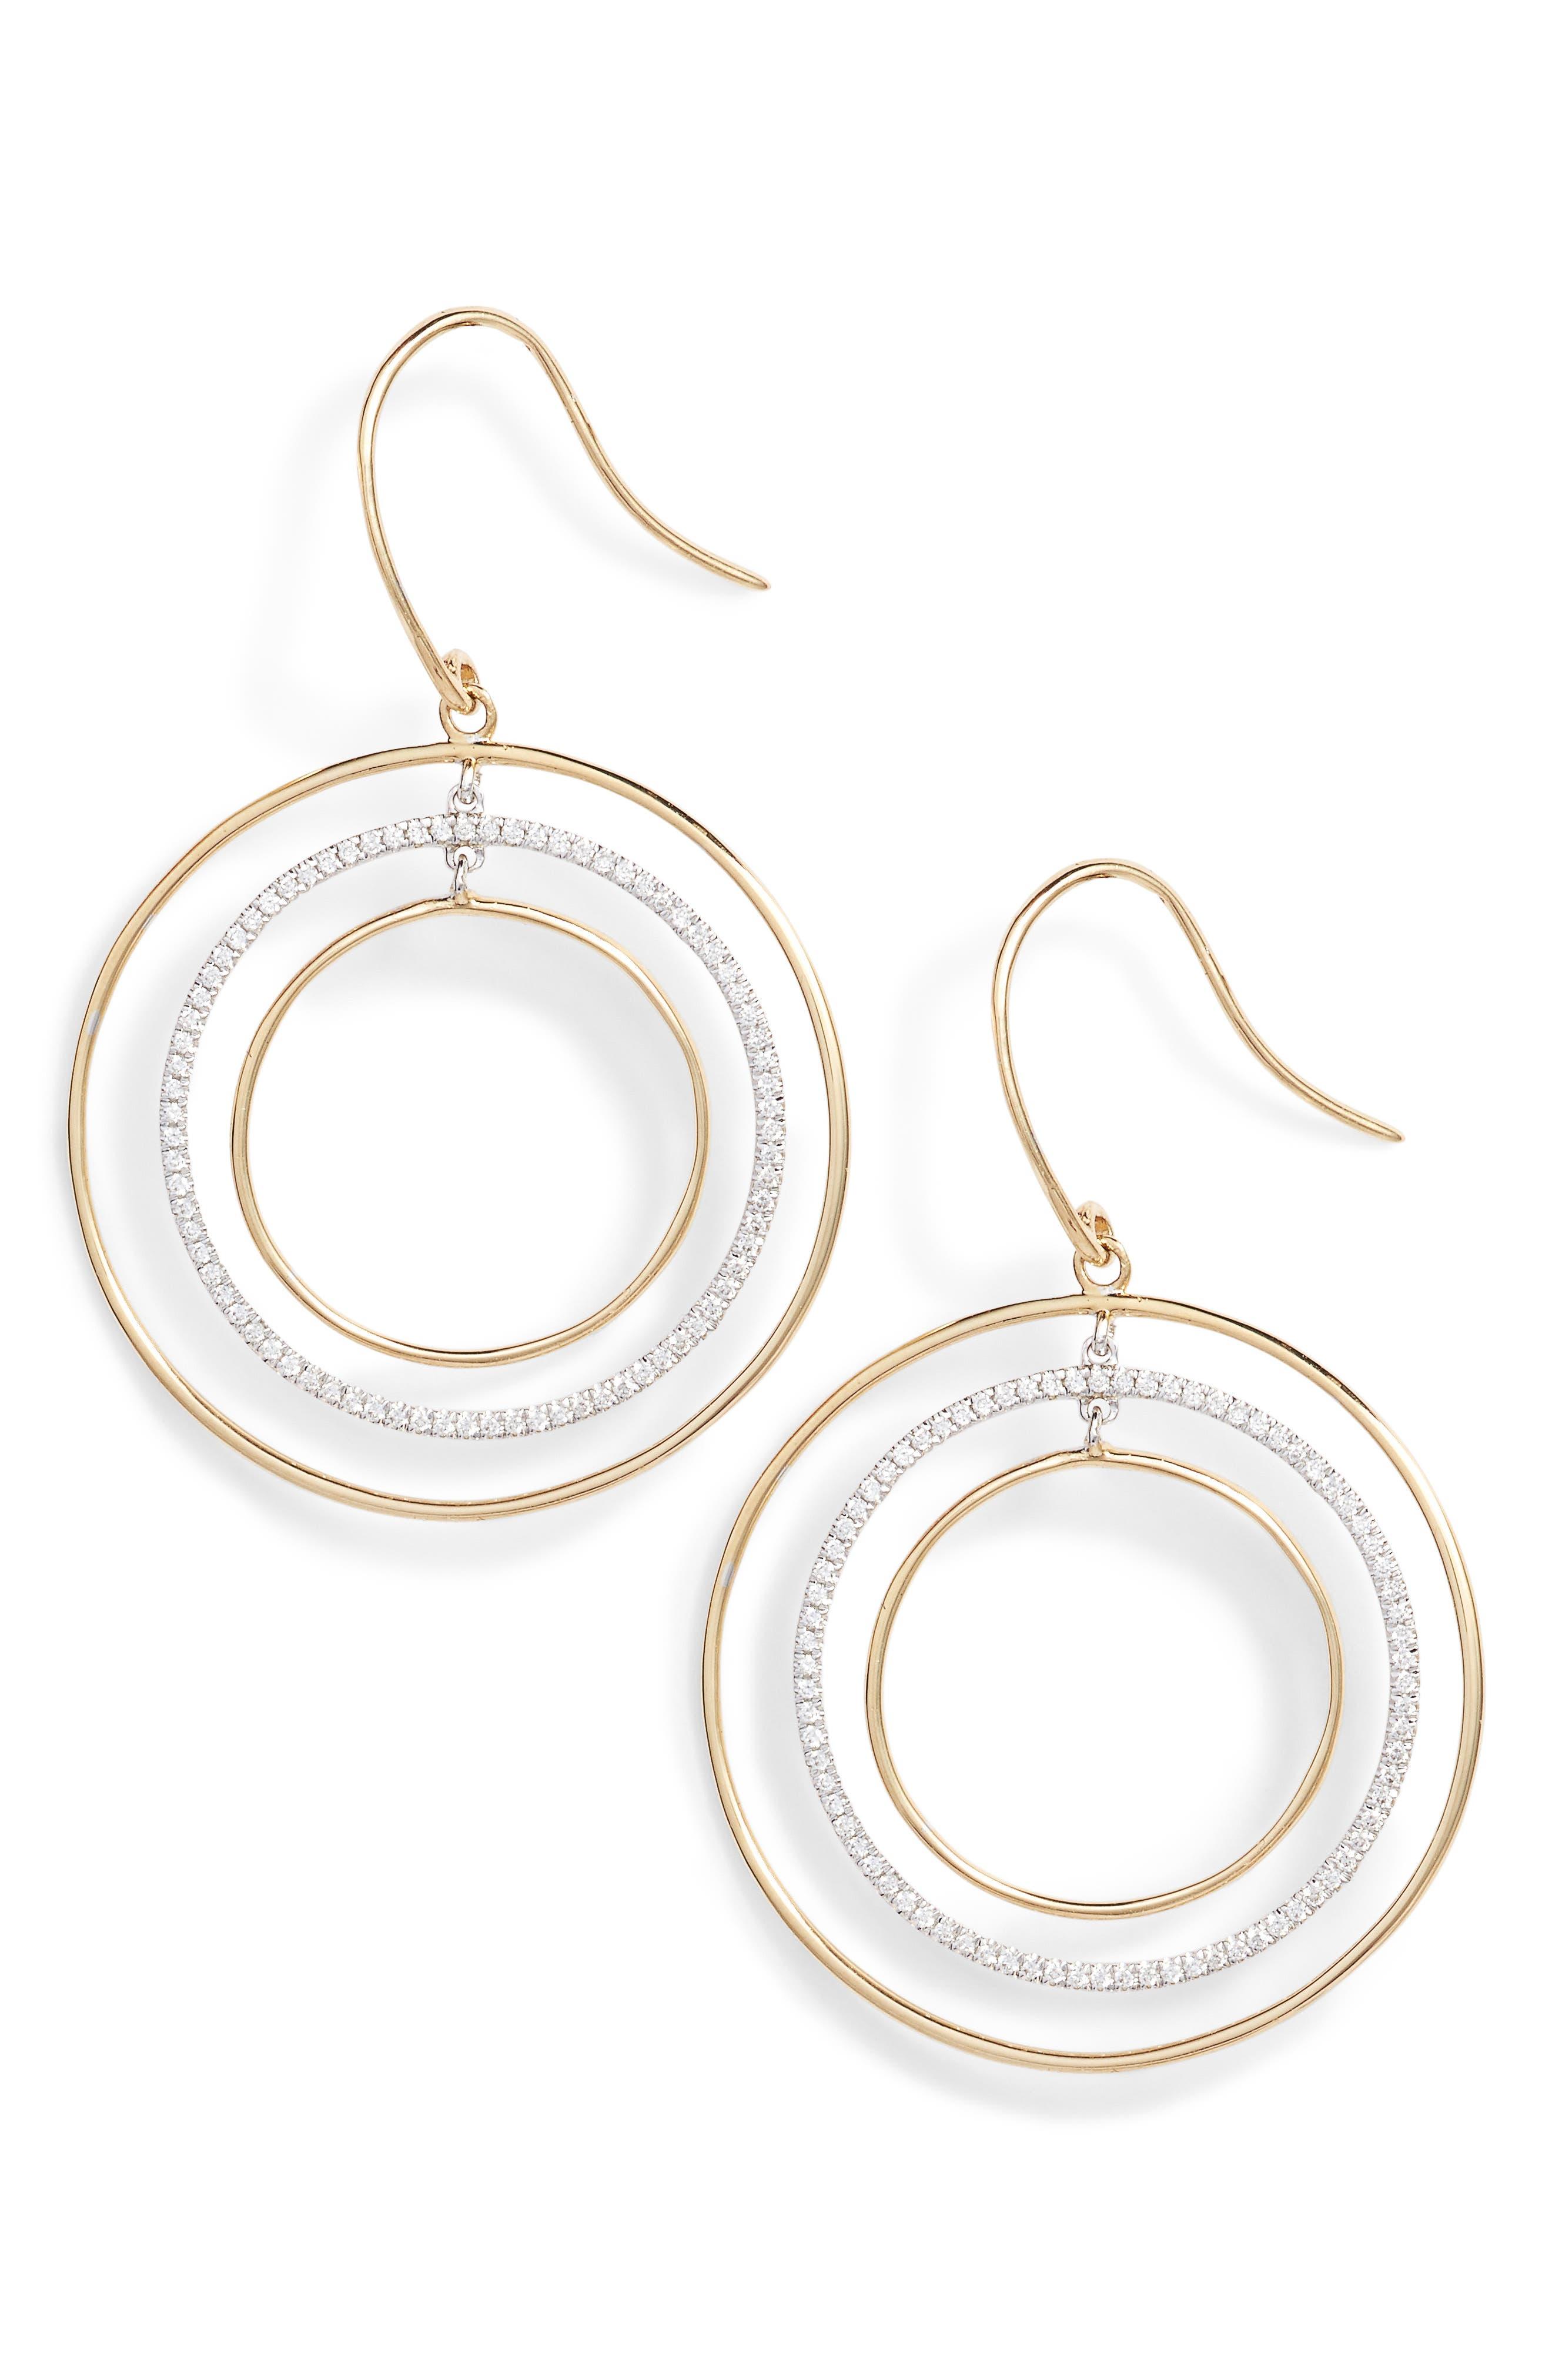 Prism Geometric Drop Earrings,                             Main thumbnail 1, color,                             Yellow Gold/ White Gold